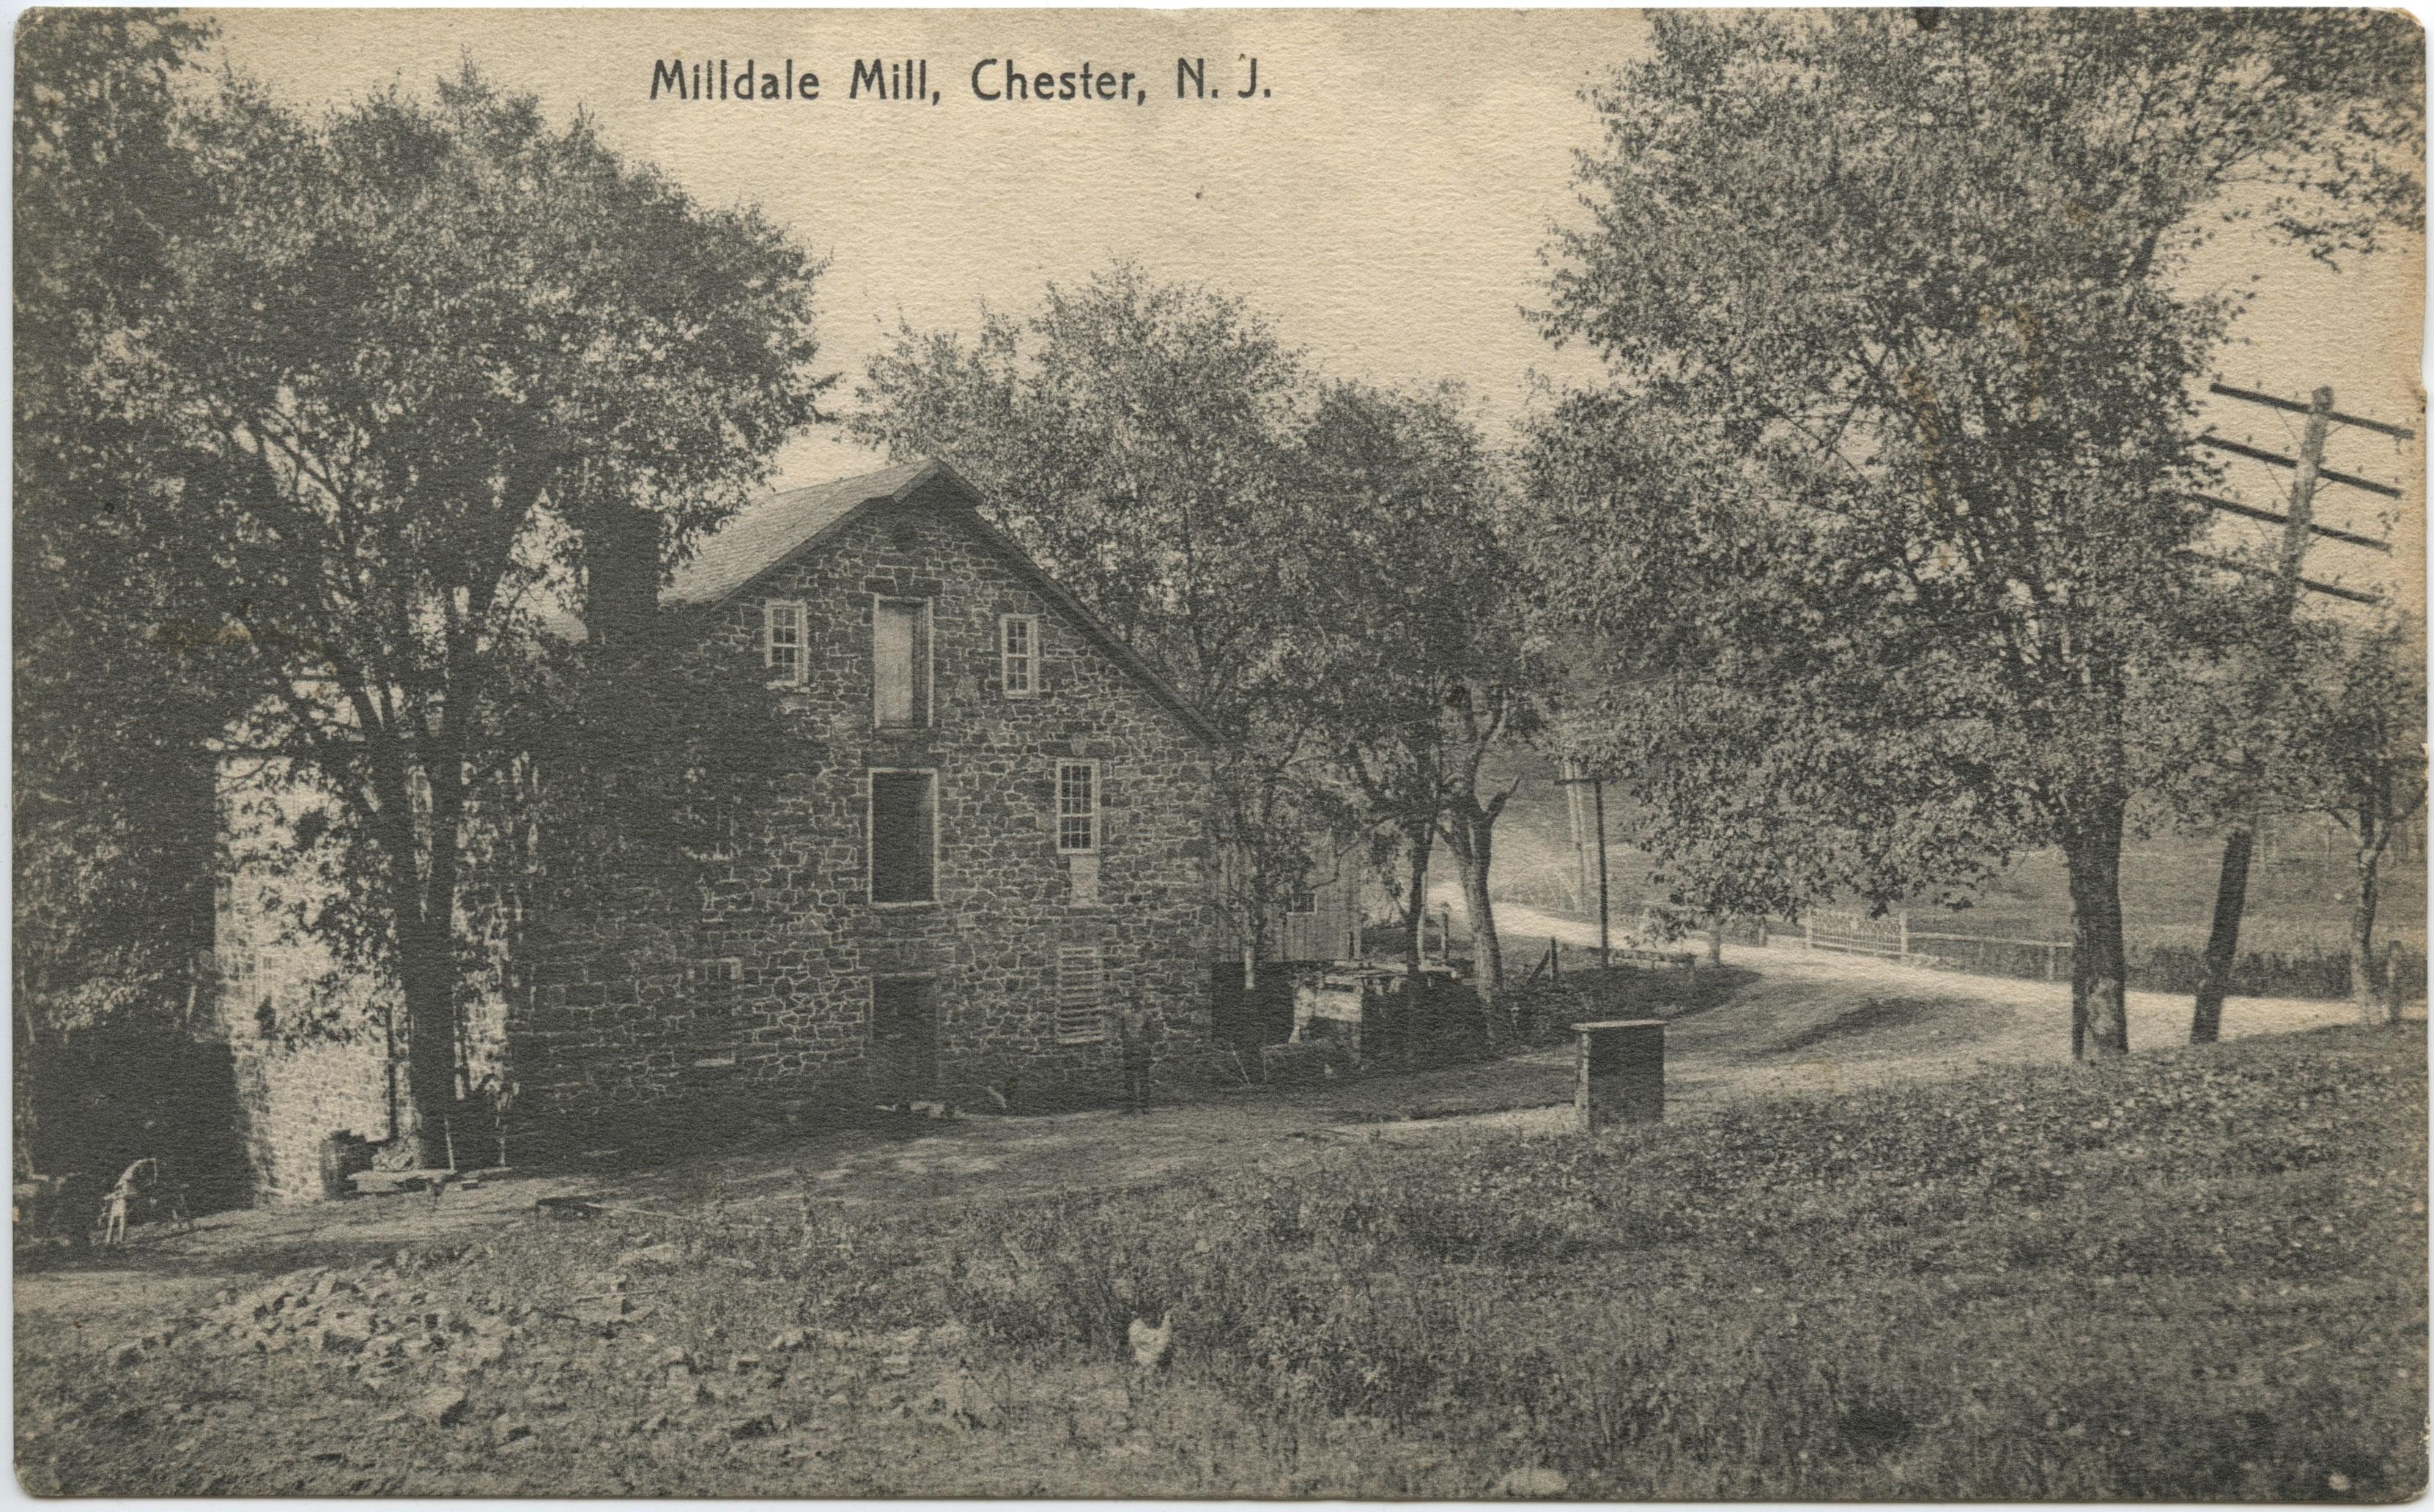 Milldale Mill